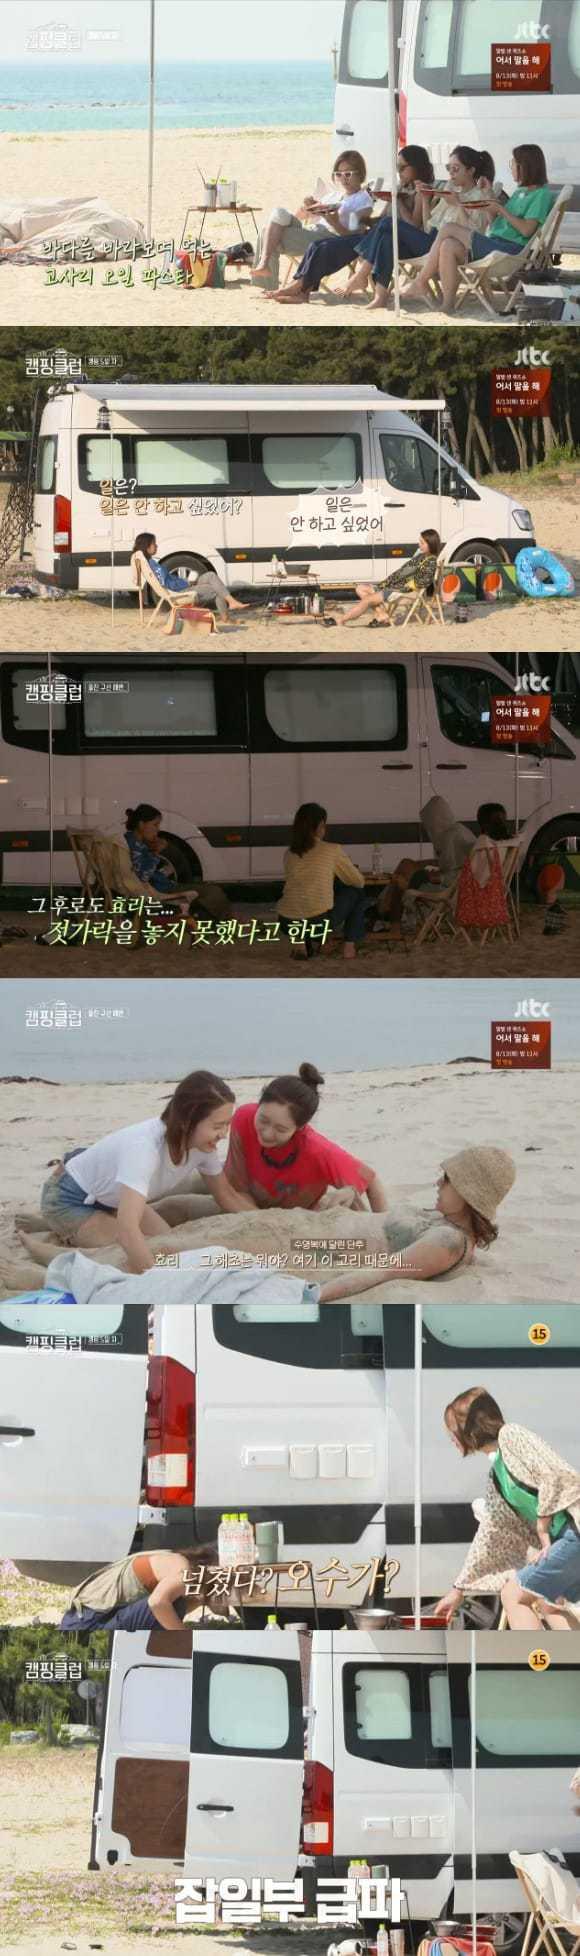 JTBC '캠핑클럽' 방송 화면 캡처 © 갓잇코리아